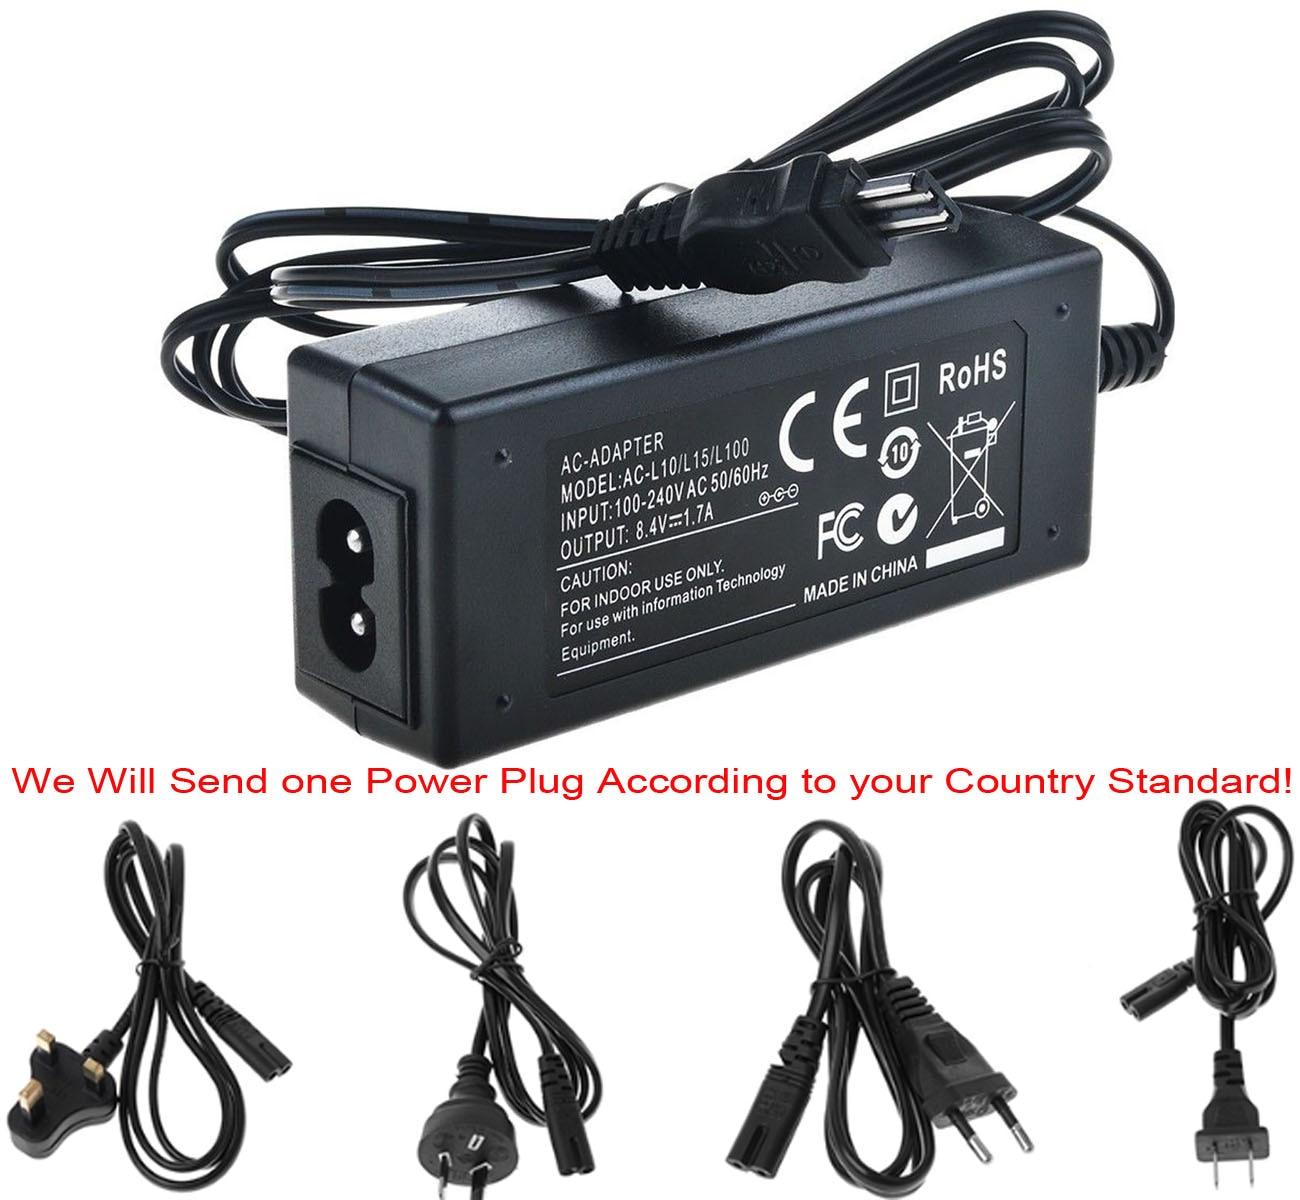 AC Cargador/adaptador de corriente para Sony CCD-TRV43E... CCD-TRV45E... CCD-TRV46E... CCD-TRV47E... CCD-TRV48E... CCD-TRV49E Cámaras grabadoras Handycam